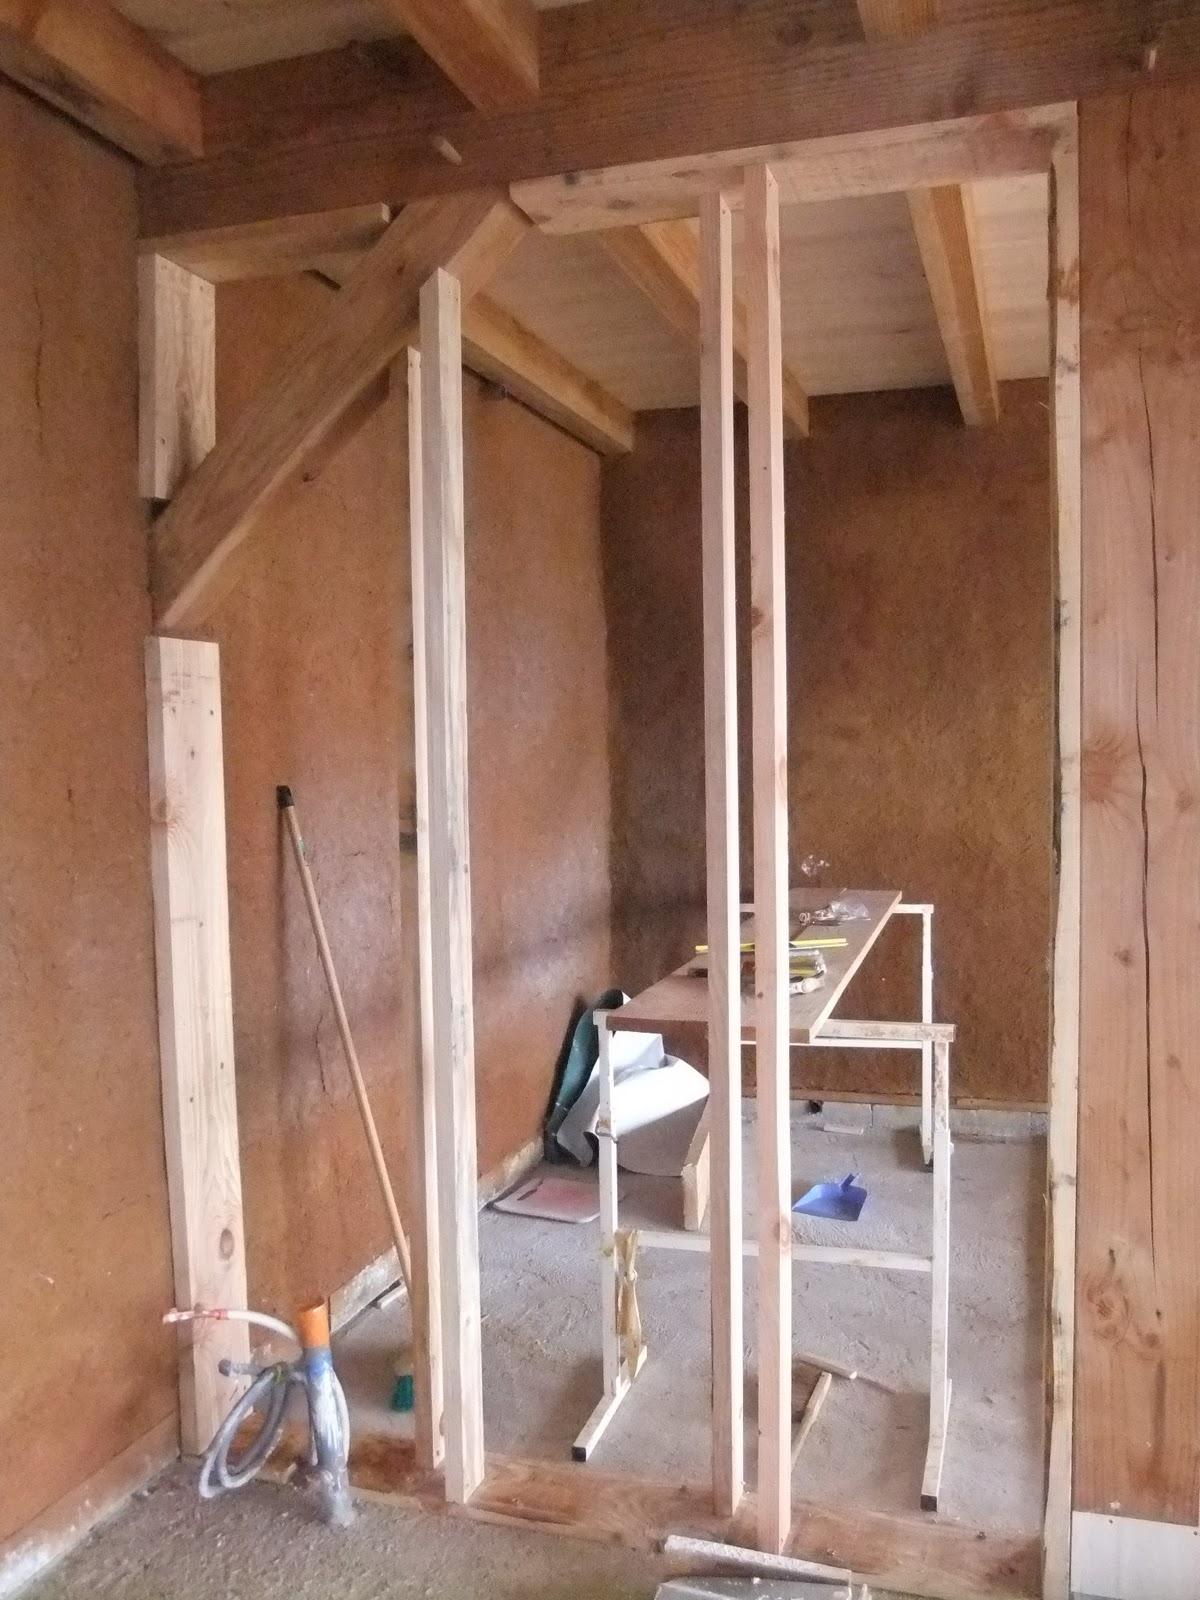 eco projet en corr ze l 39 ossature des cloisons du cellier. Black Bedroom Furniture Sets. Home Design Ideas